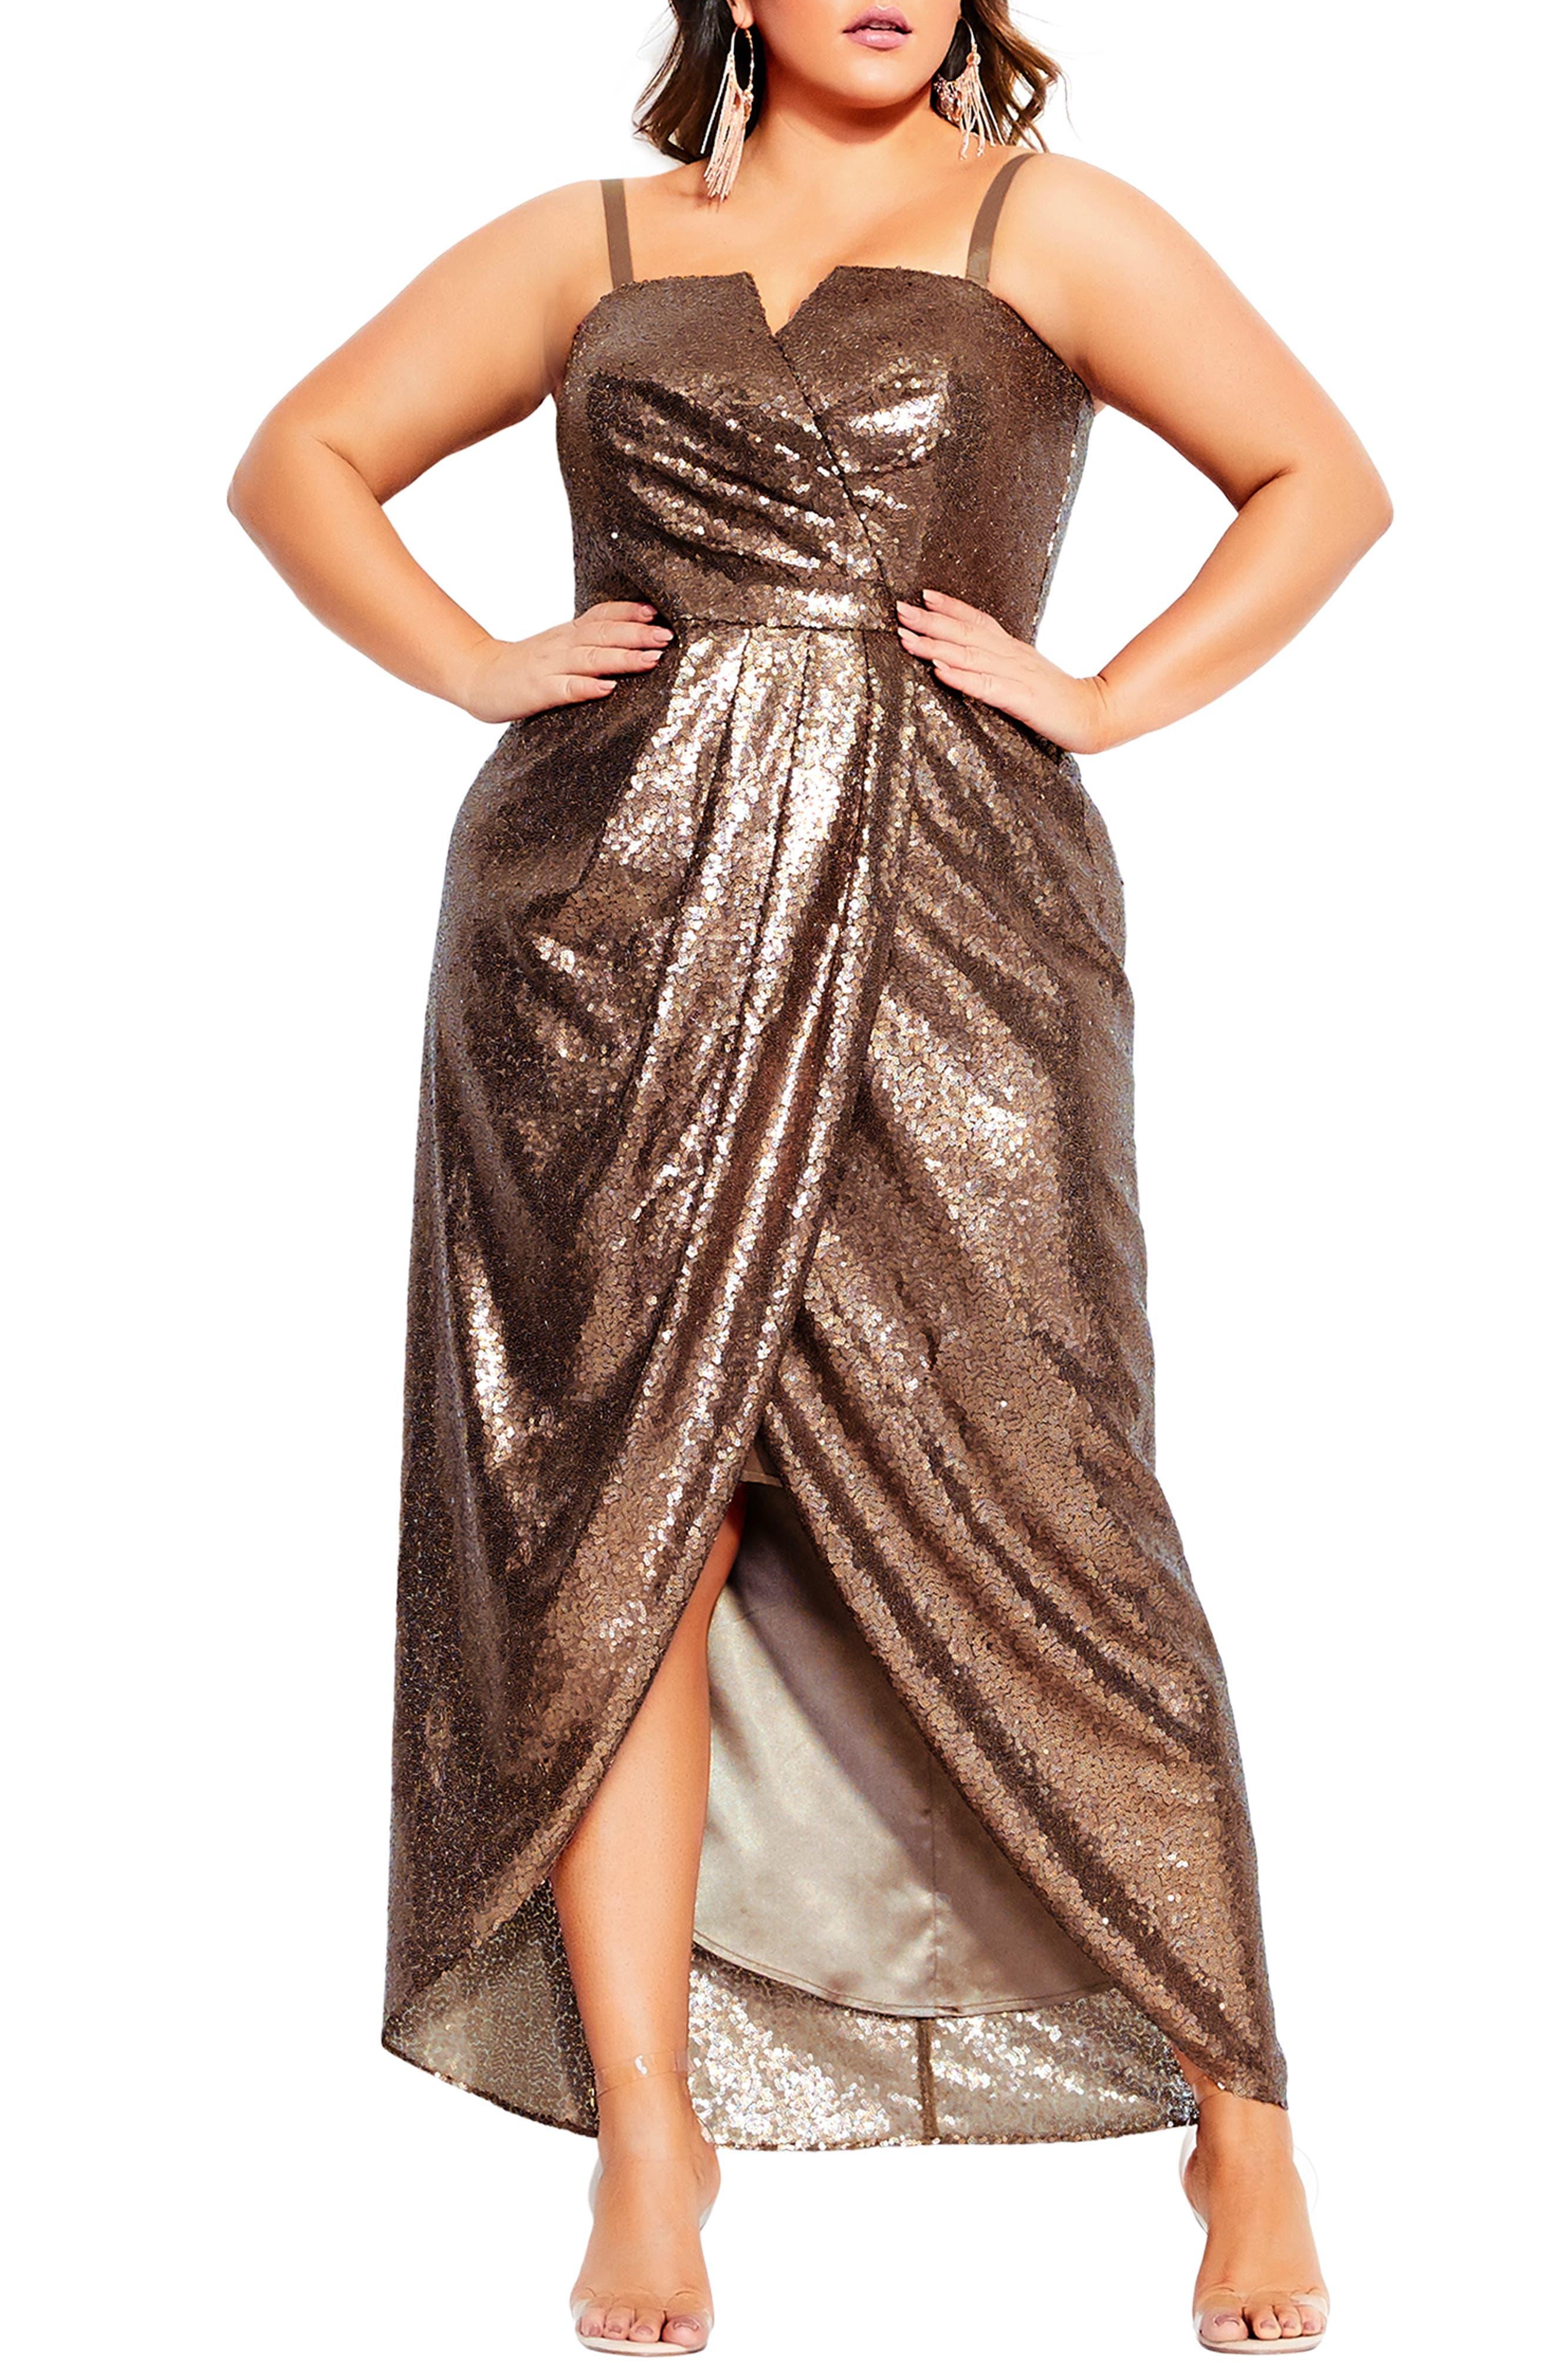 70s Dresses – Disco Dress, Hippie Dress, Wrap Dress Plus Size Womens City Chic Siren Sequin Convertible Strapless Gown Size Medium - Metallic $189.00 AT vintagedancer.com